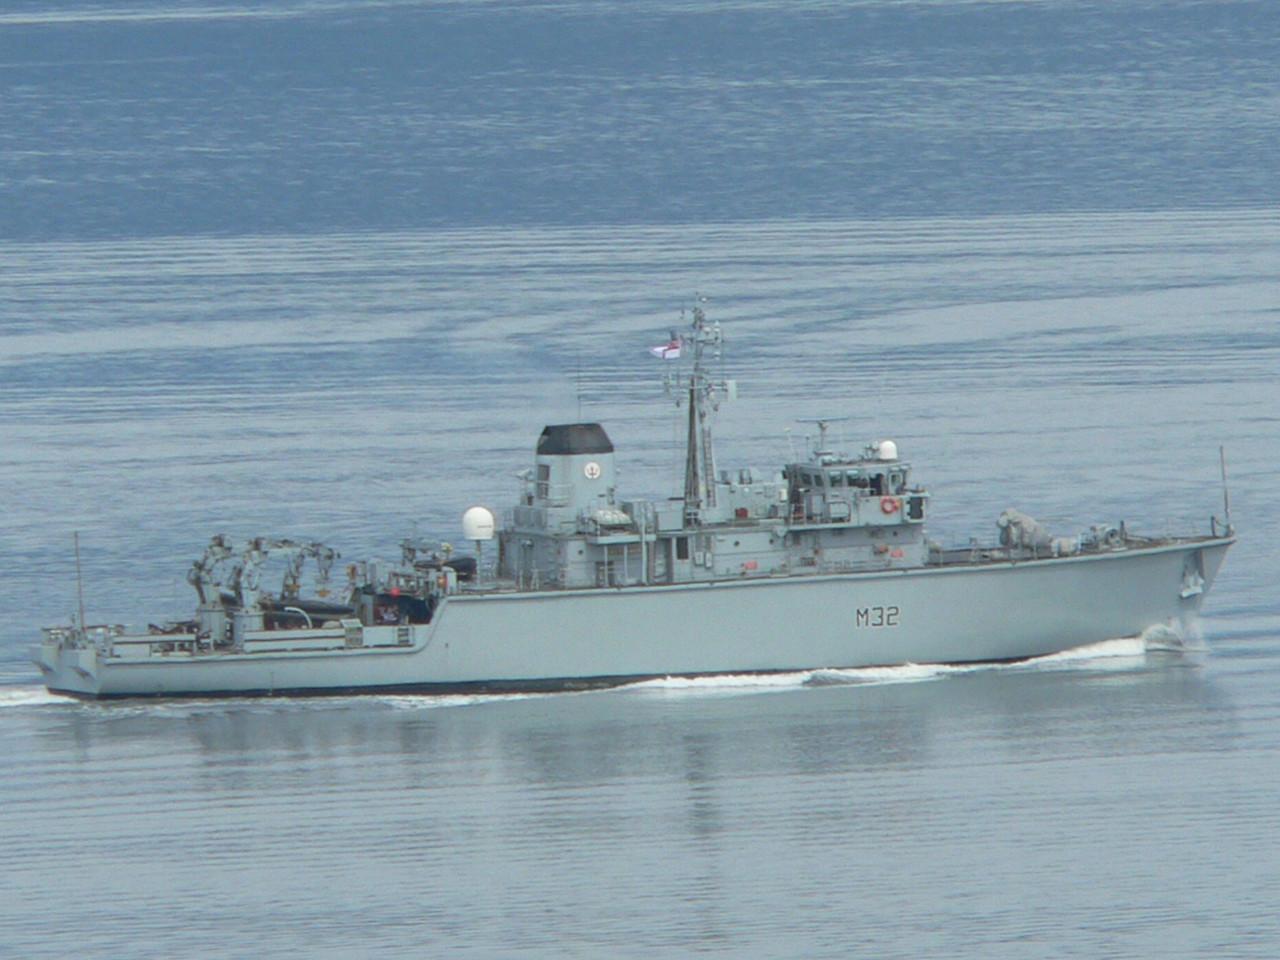 M-32 HMS COTTESMORE